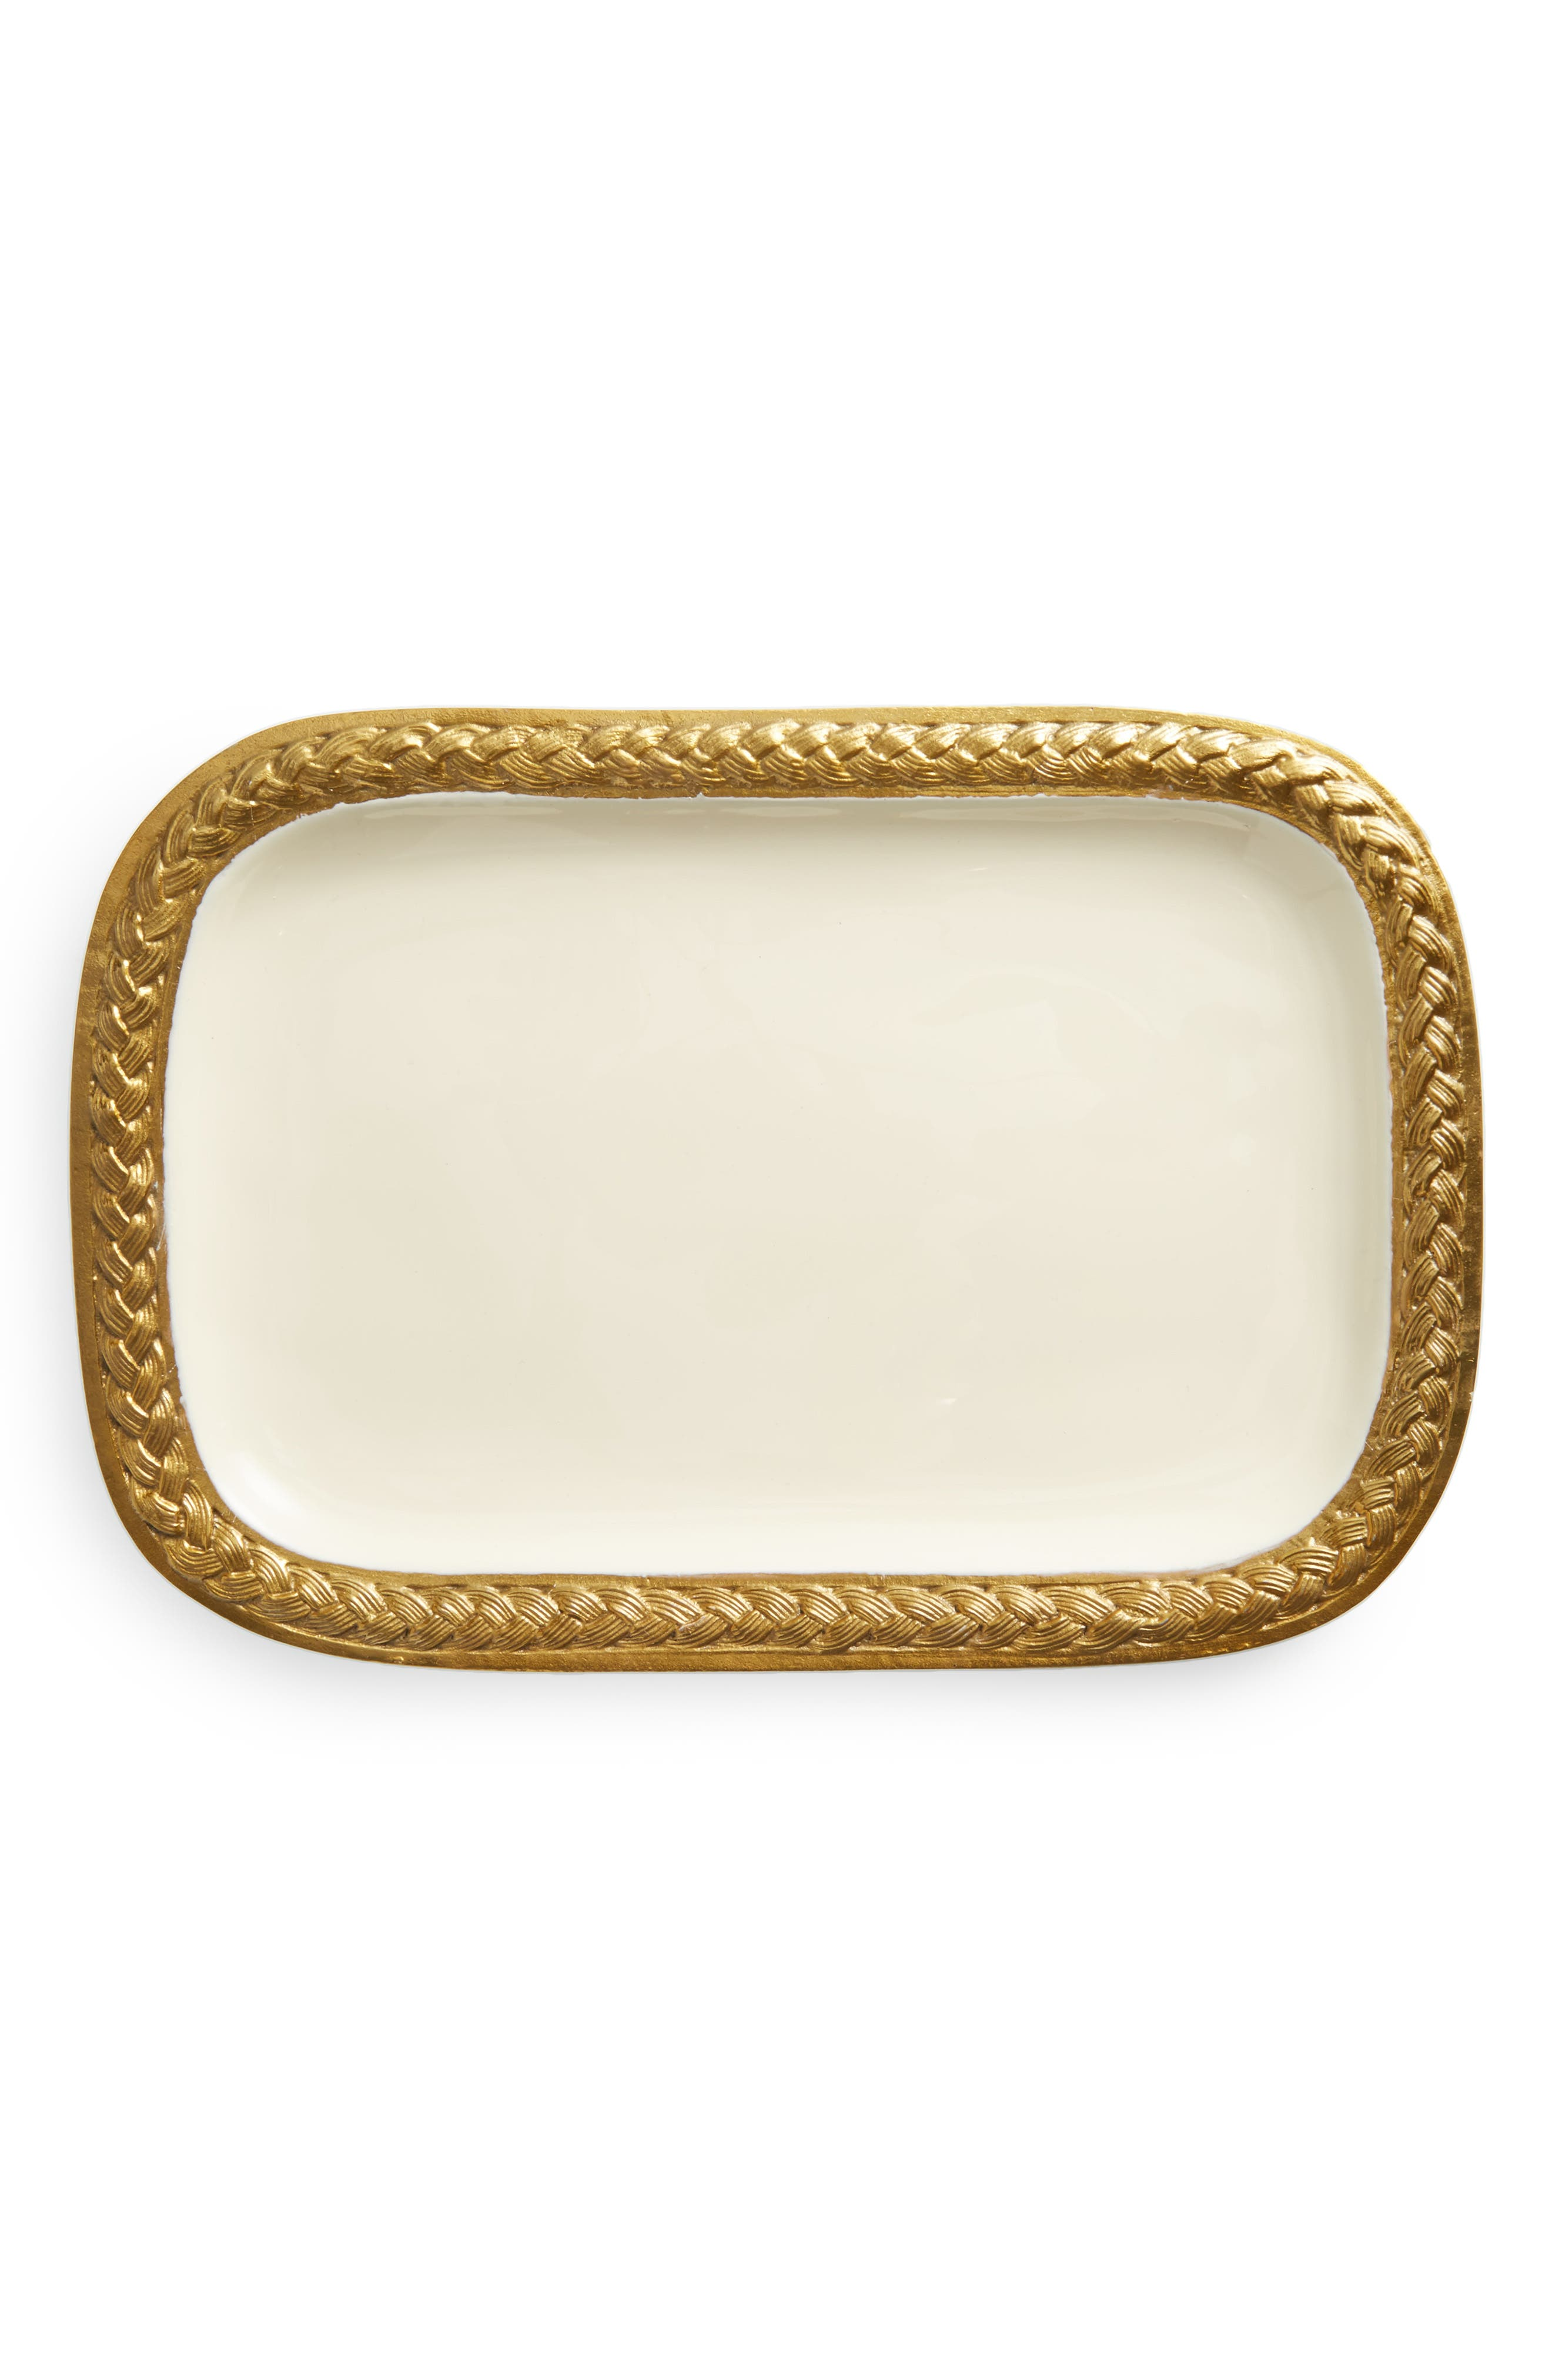 Alternate Image 1 Selected - Marigold Artisans Braid Platter